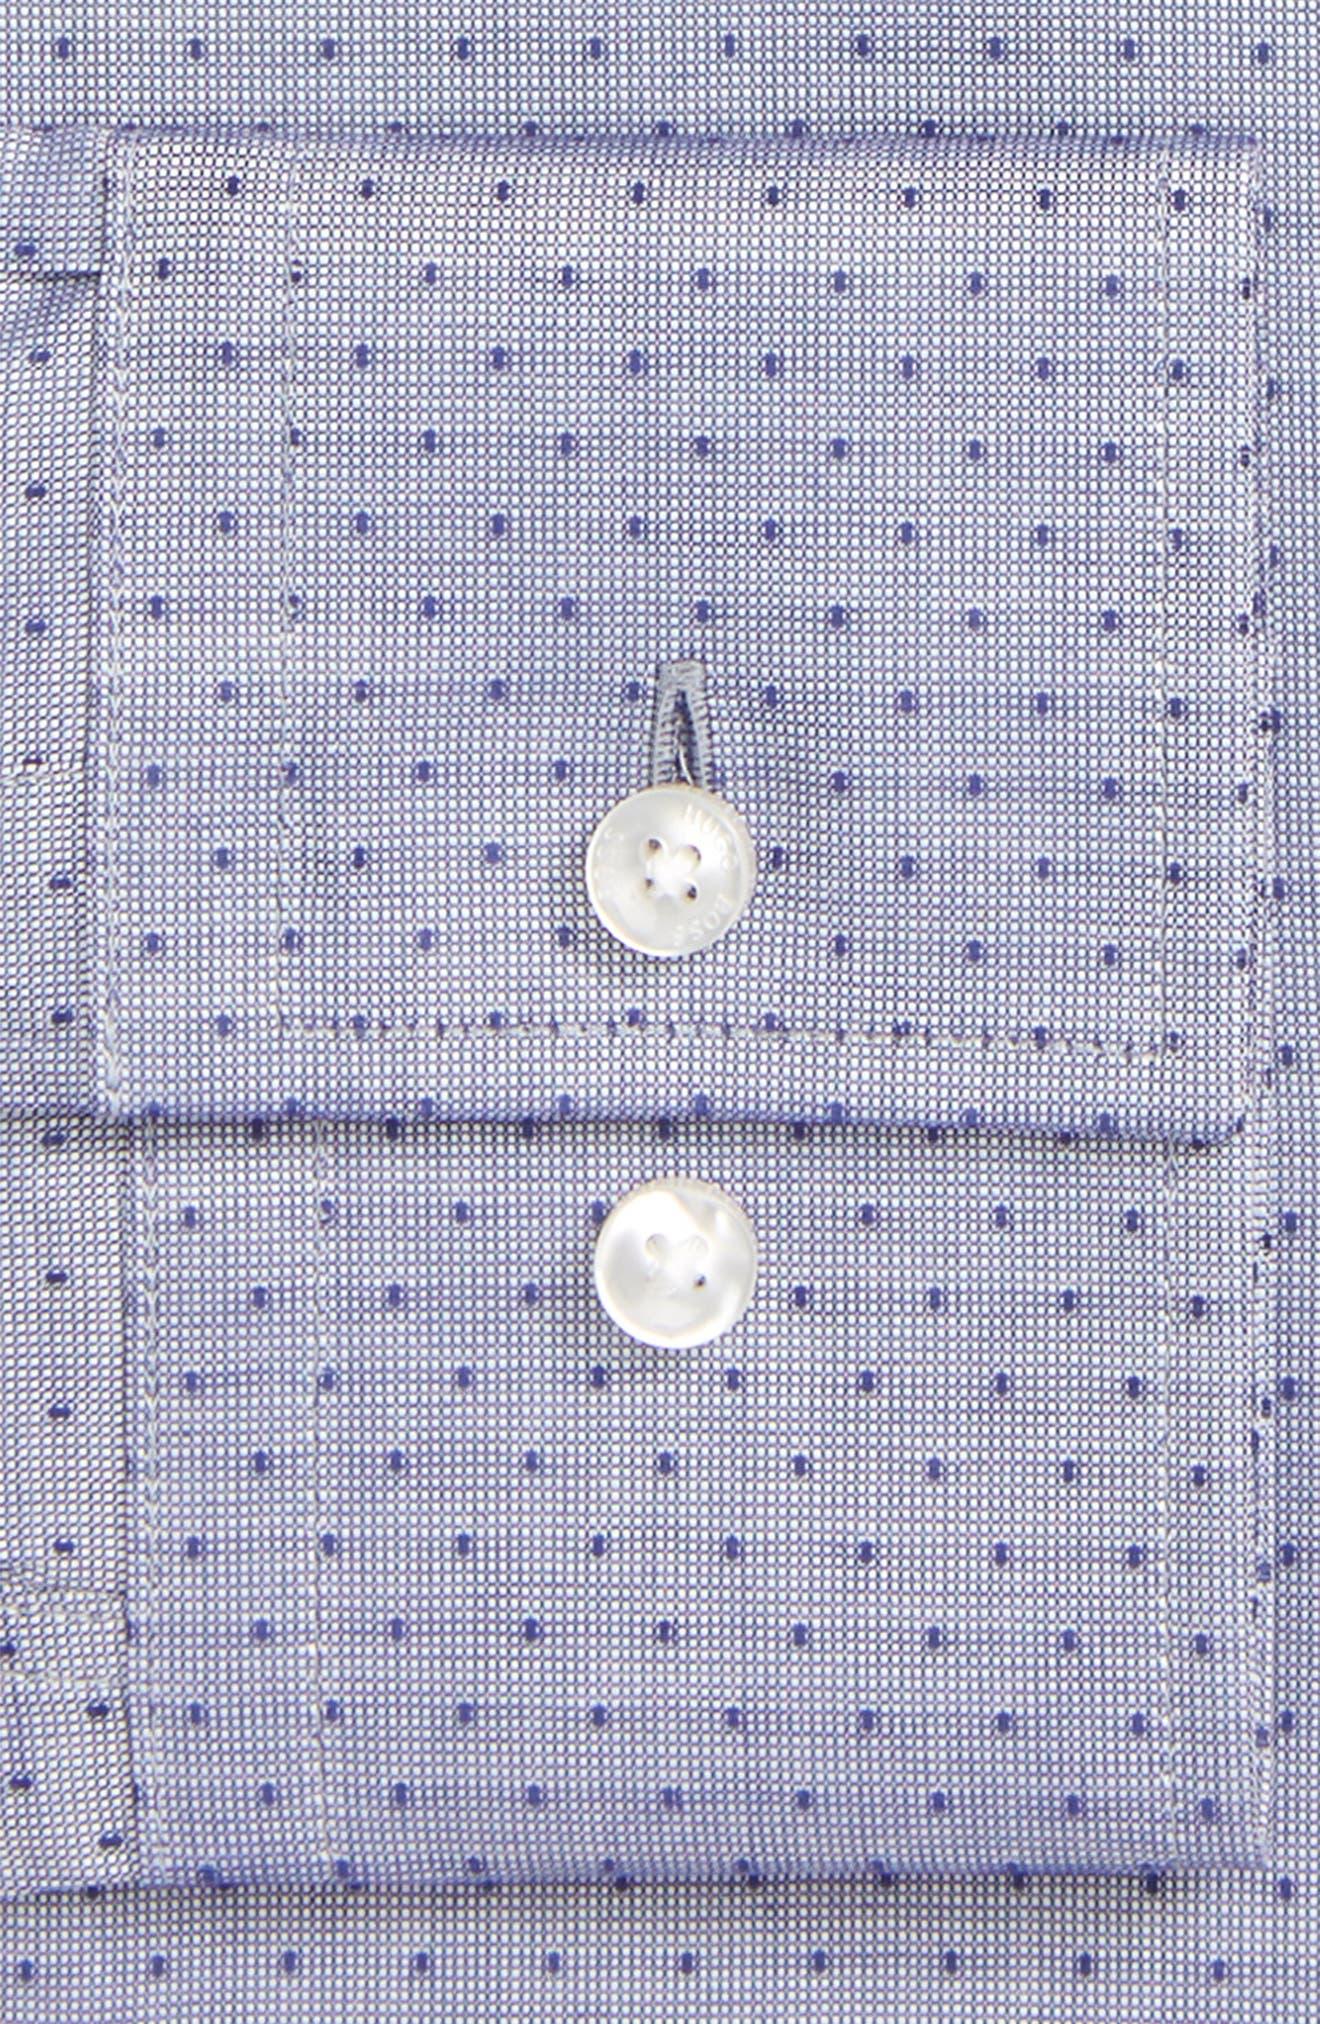 Jason Slim Fit Dot Dress Shirt,                             Alternate thumbnail 6, color,                             NAVY